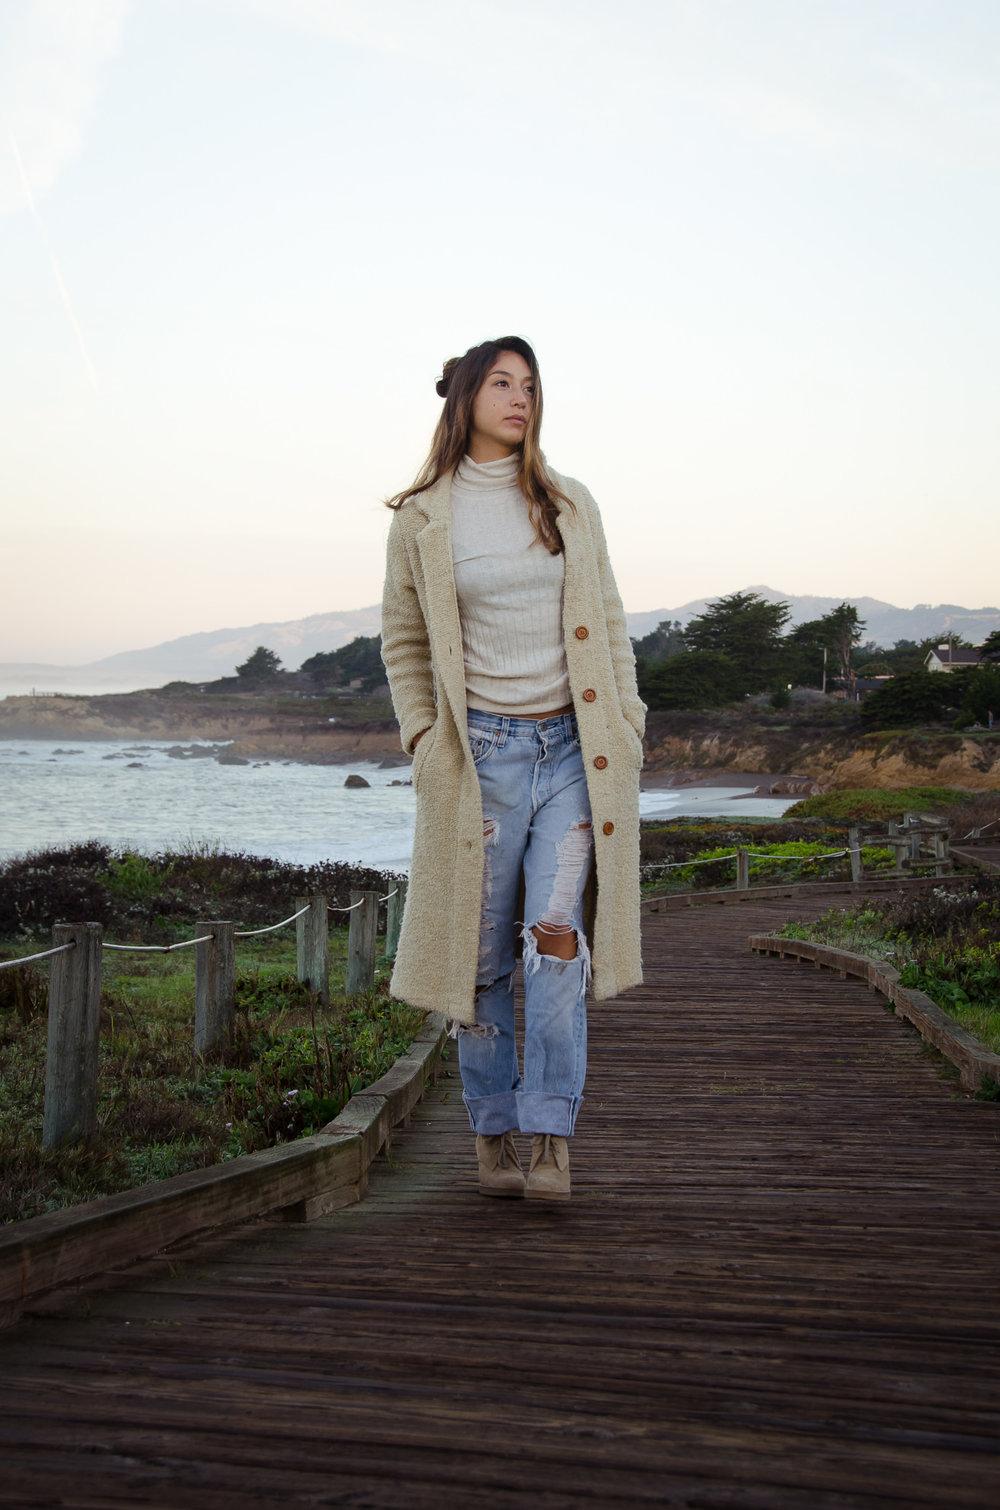 Big Sur Cambria Roadtrip Miranda Kelton Photography Lifestyle Fashion Santa Barbara-1.jpg